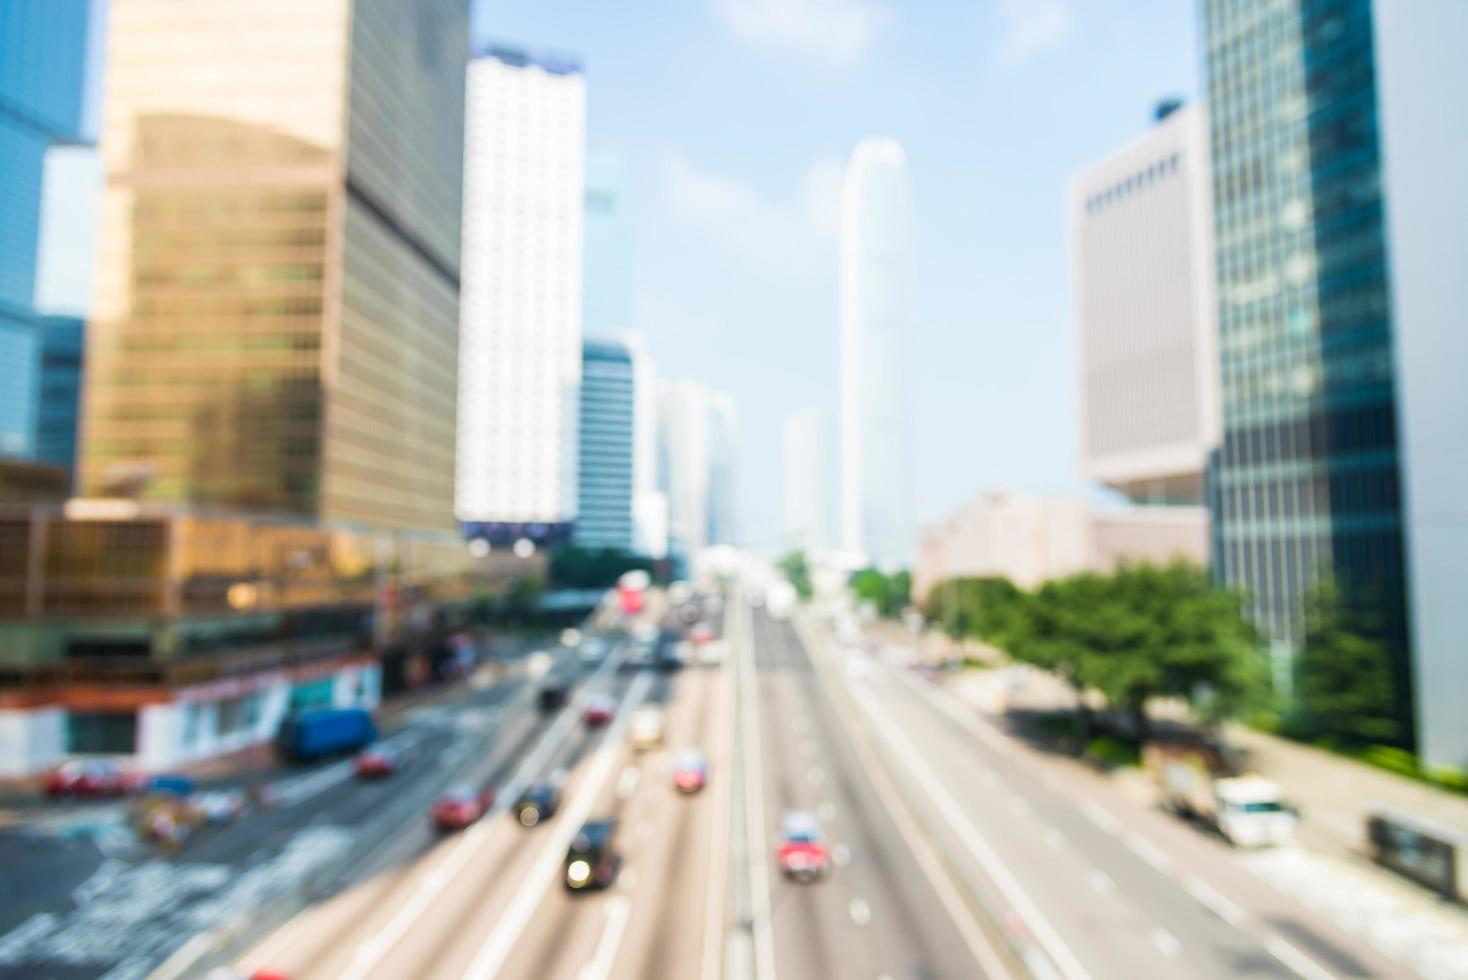 abstrakt oskärpa Hong Kong City bakgrund foto